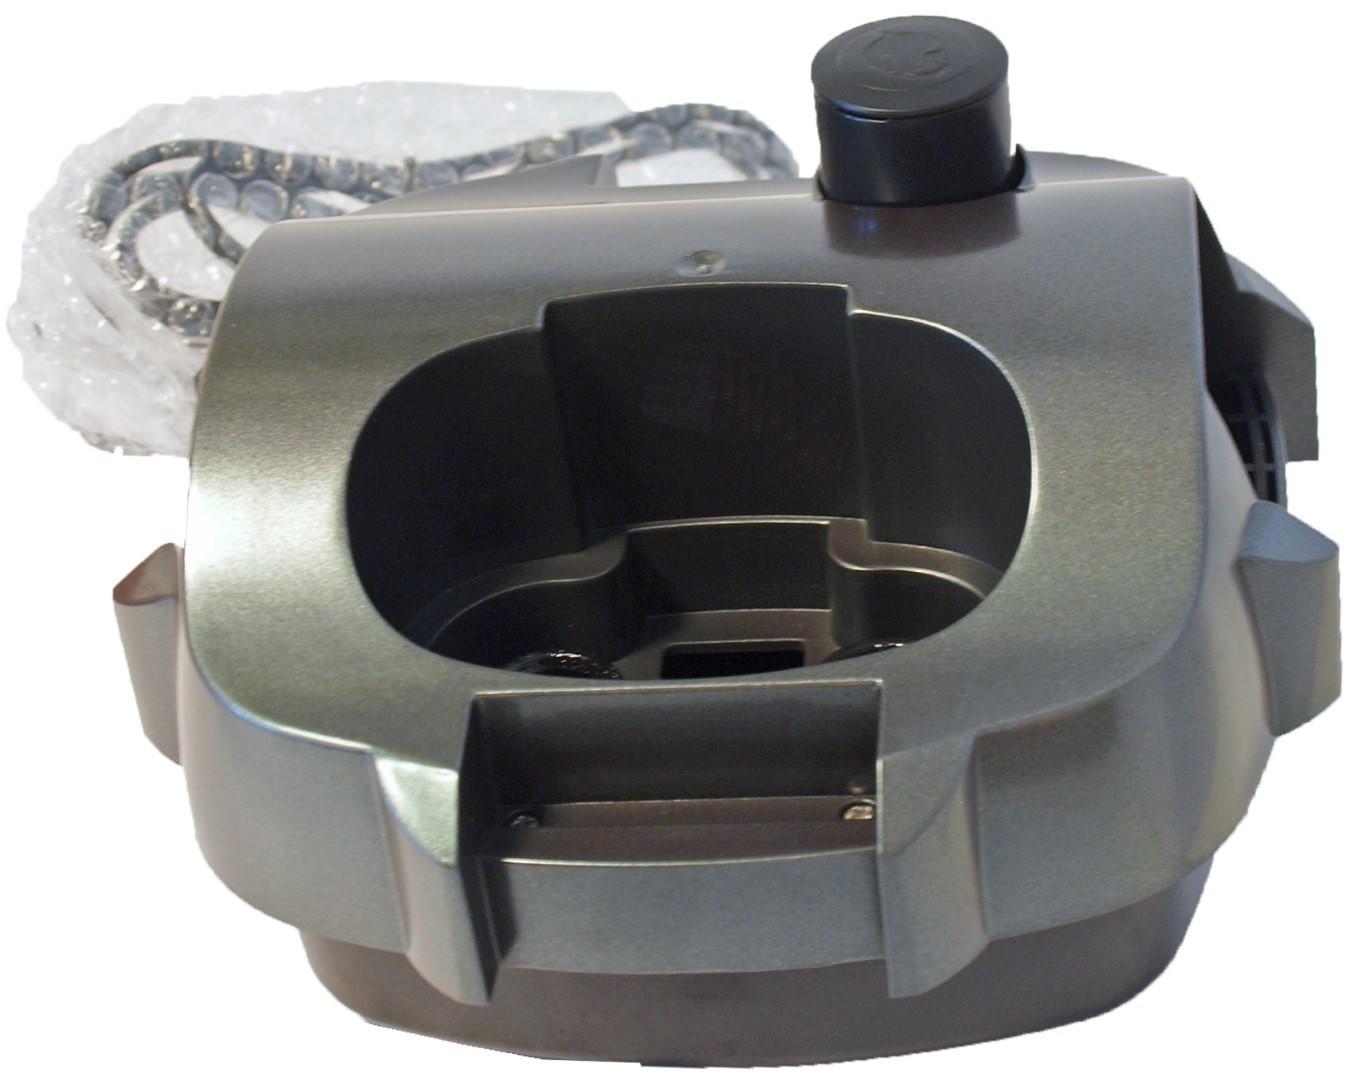 Tetra motor compleet EX 400 plus